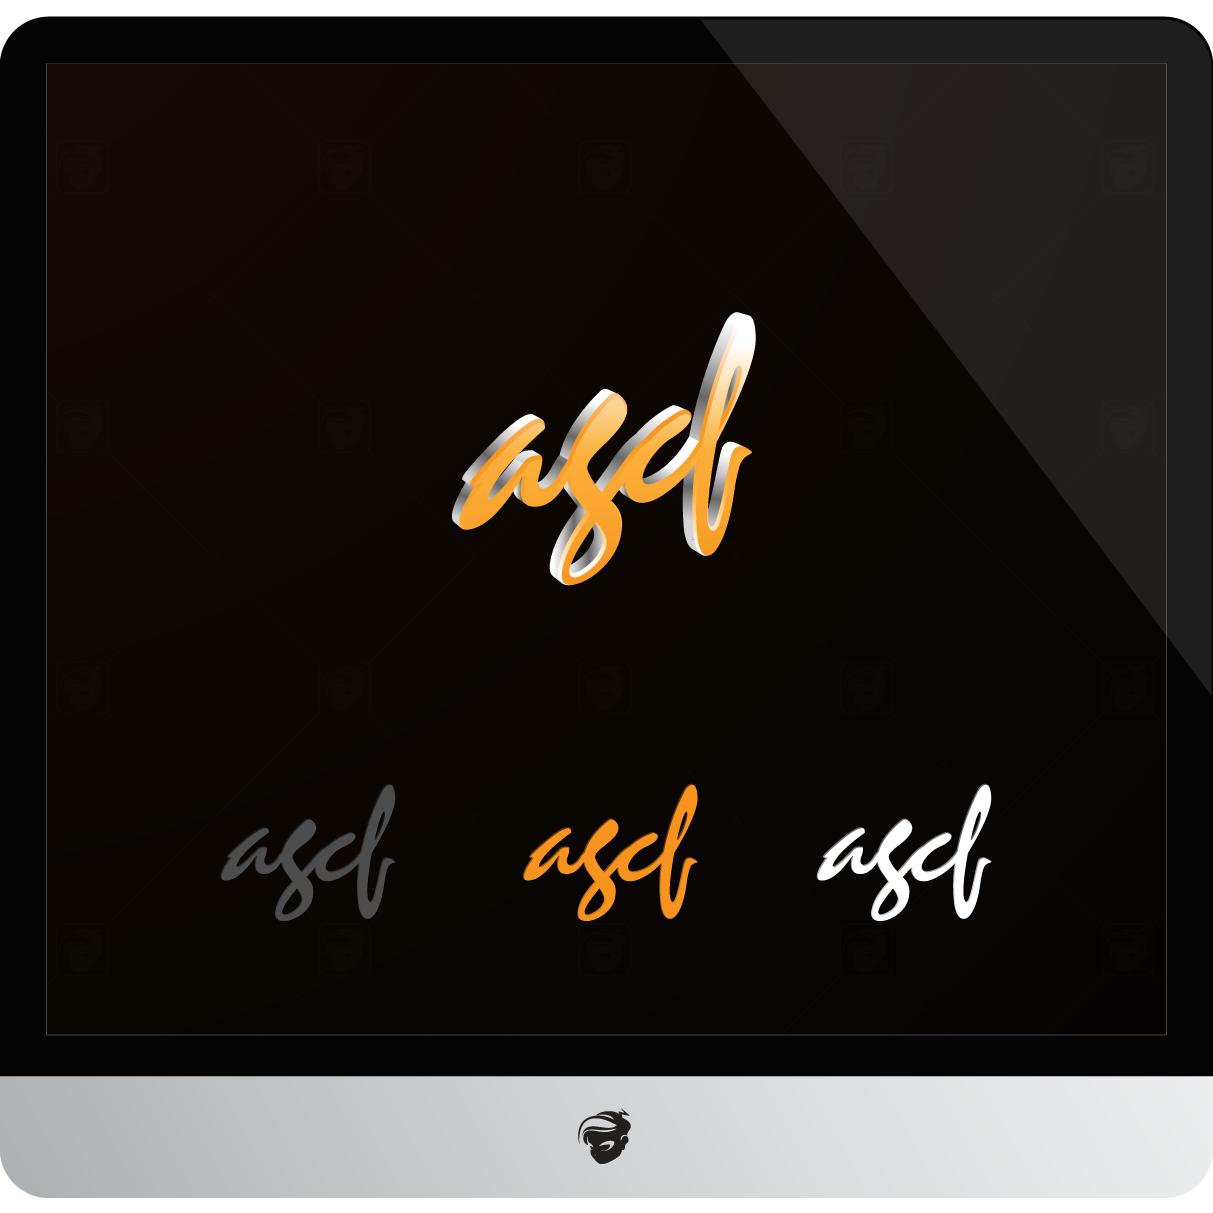 Logo Design by zesthar - Entry No. 179 in the Logo Design Contest Imaginative Logo Design for AGCF.